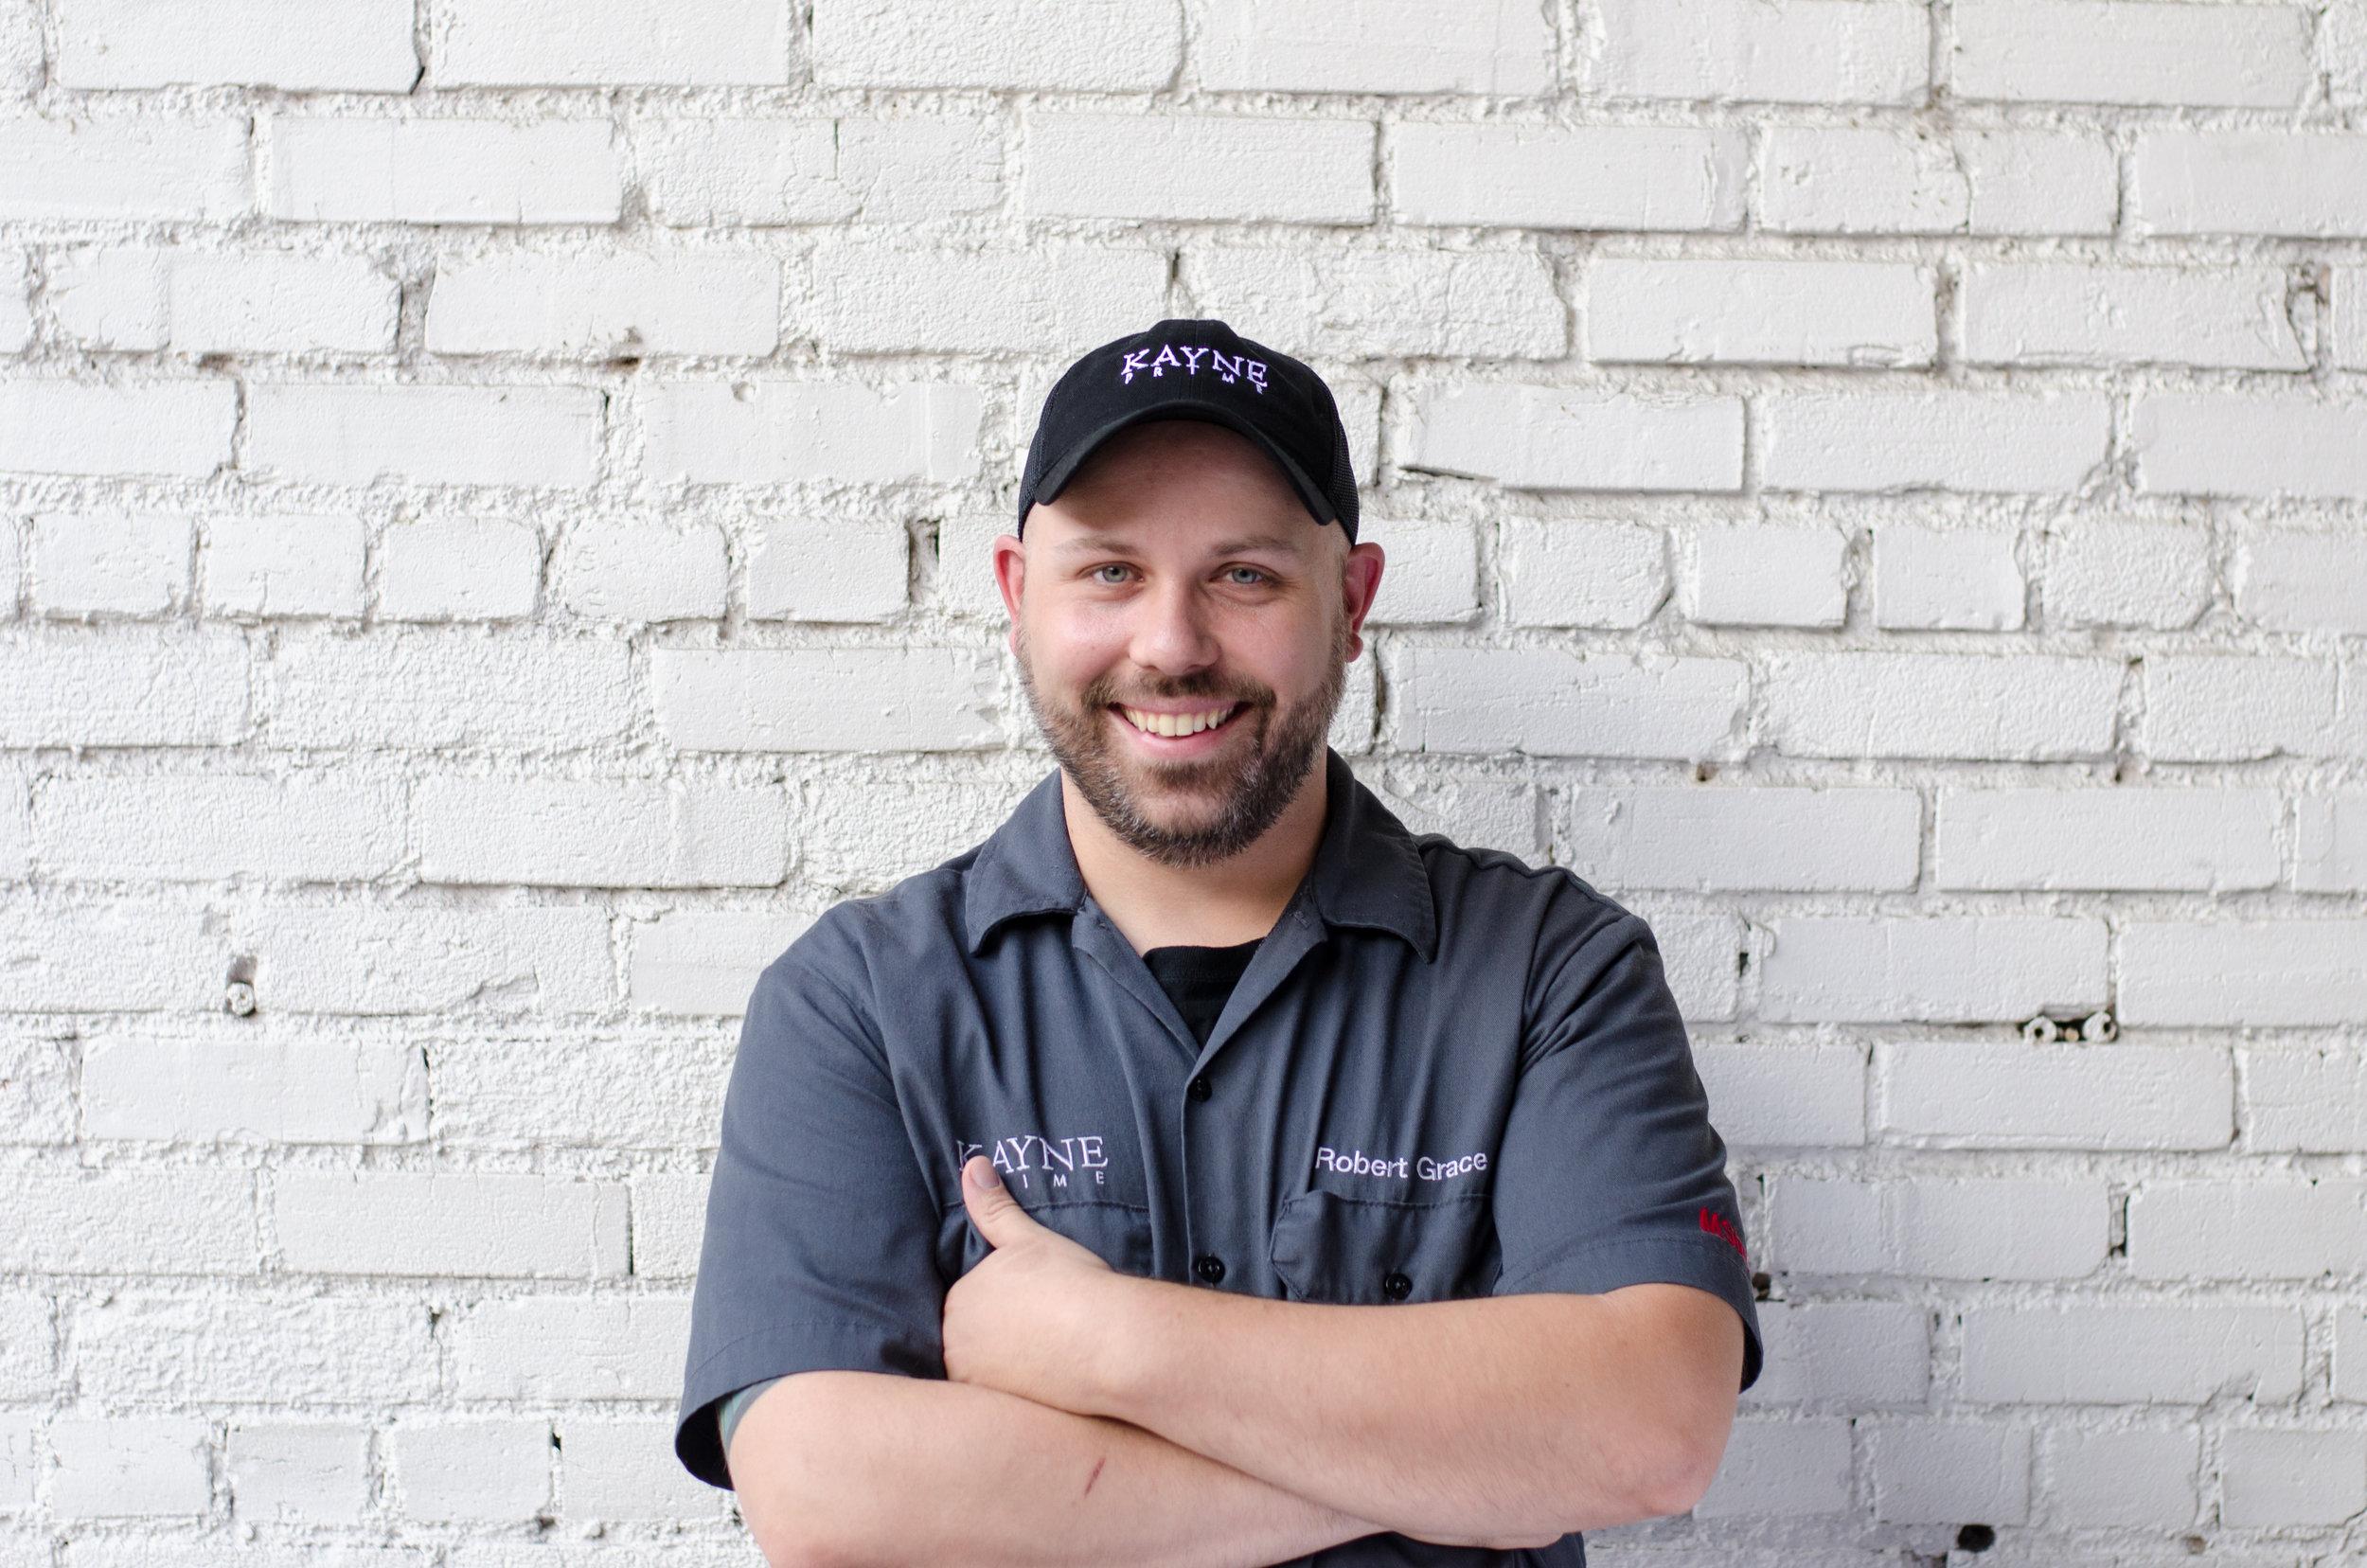 Robert Grace continues to serve as the Executive Chef of Kayne Prime alongside Chef de Cuisine Steven Chandler